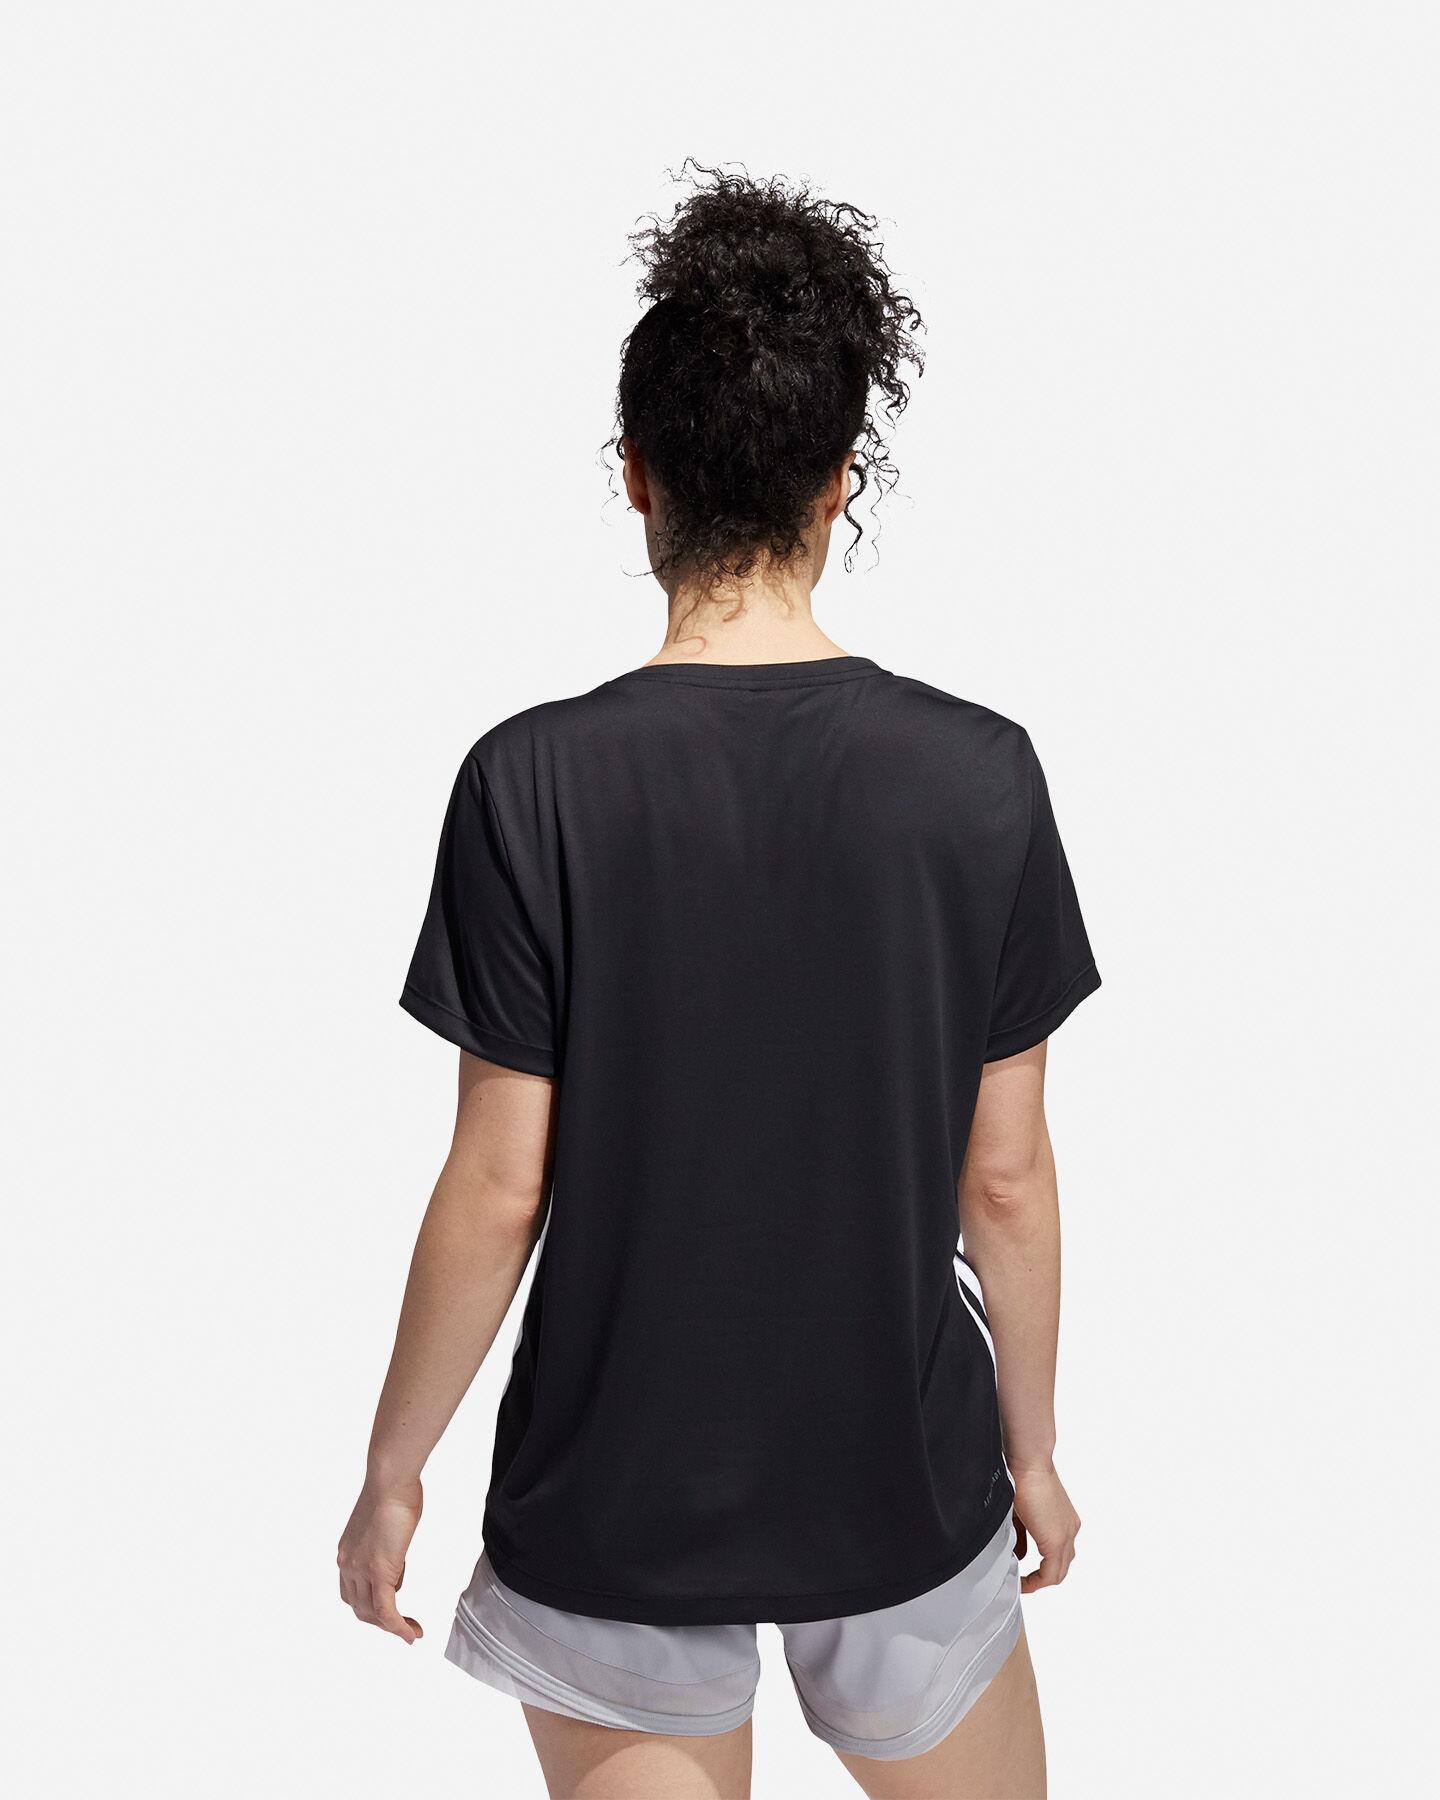 T-Shirt training ADIDAS 3 STRIPES W S5218163 scatto 4